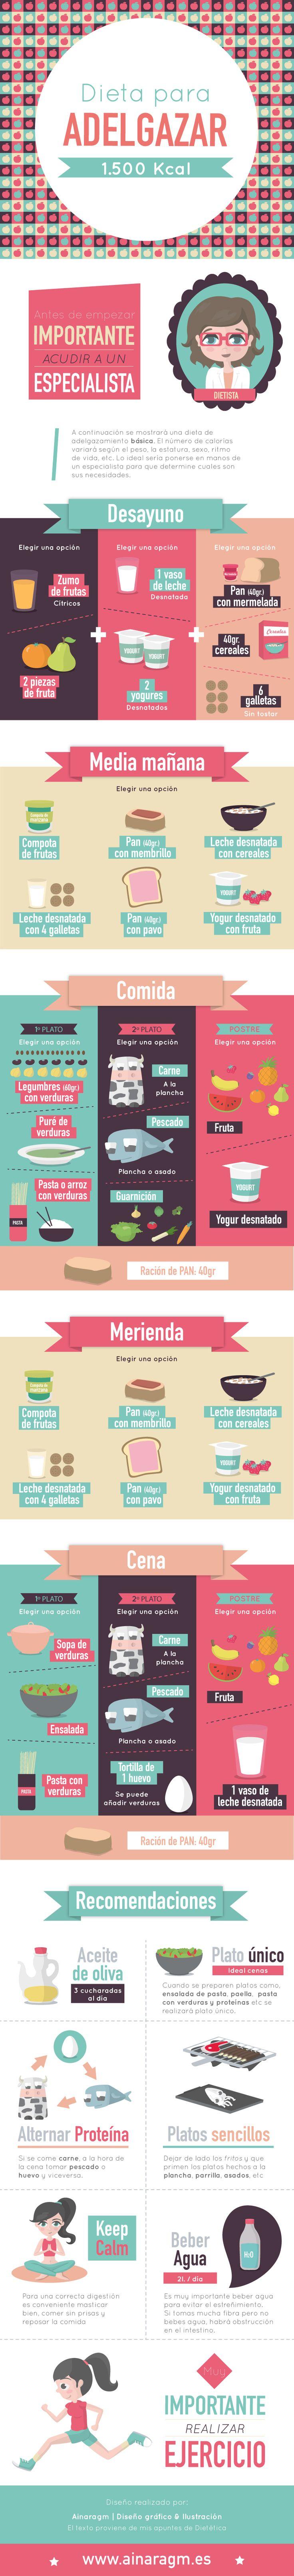 #Infografia sobre una dieta de adelgazamiento #adelgazar